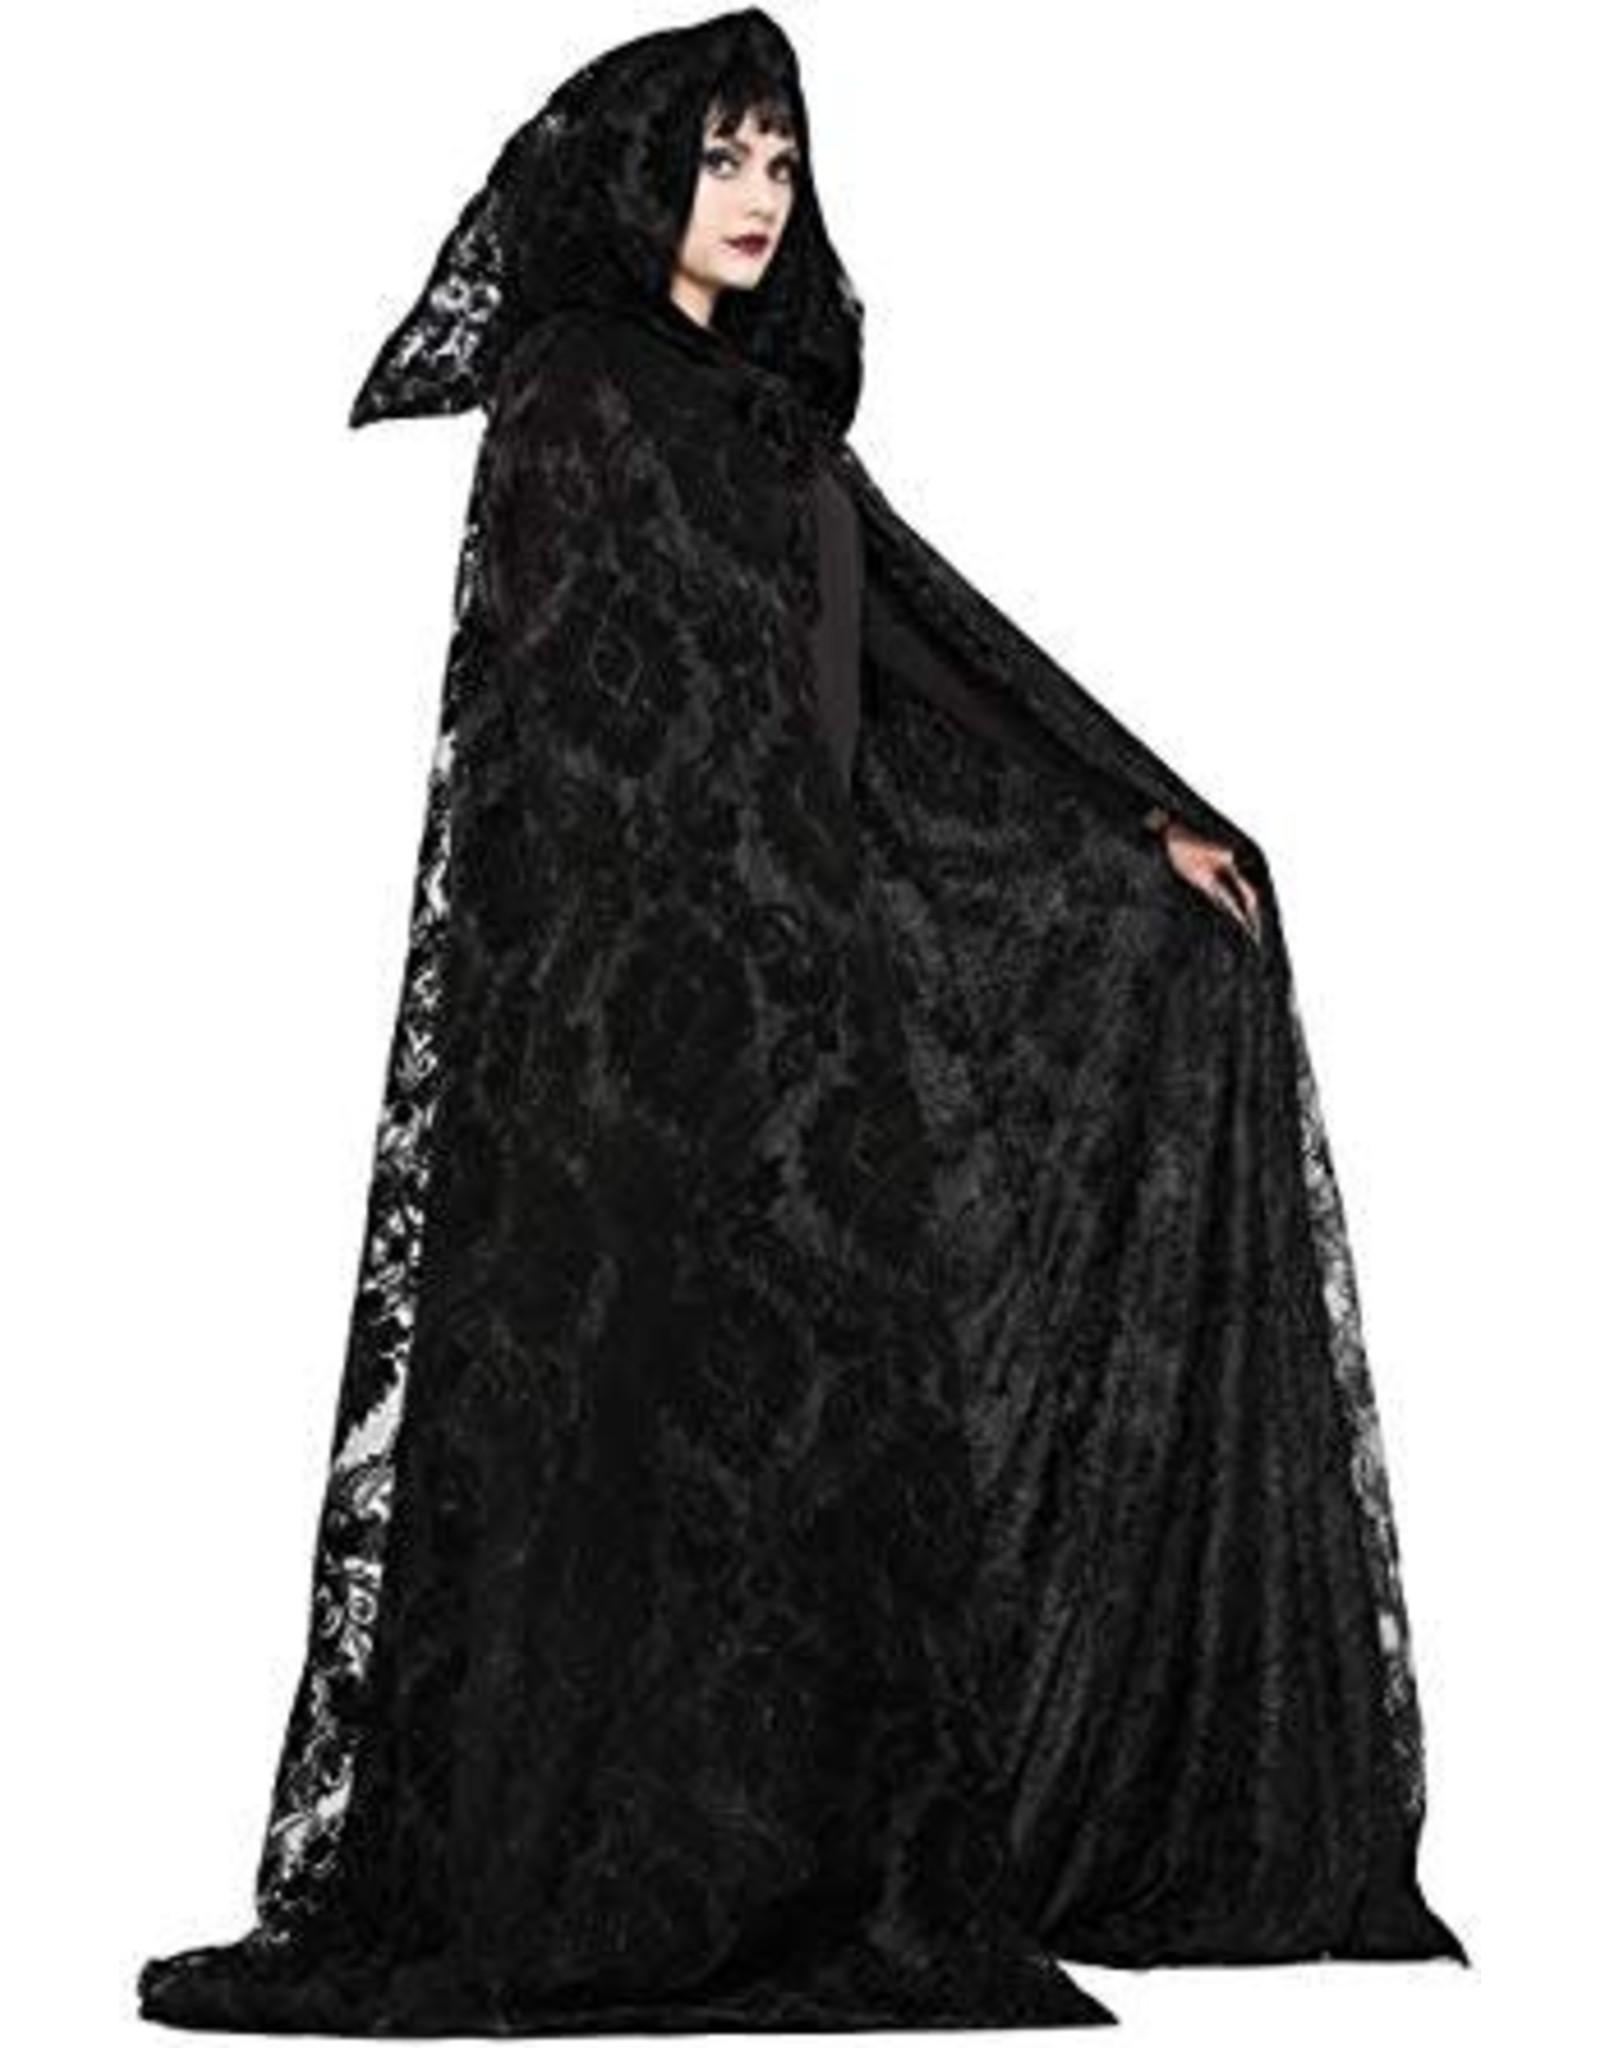 Forum Midnight Cloak